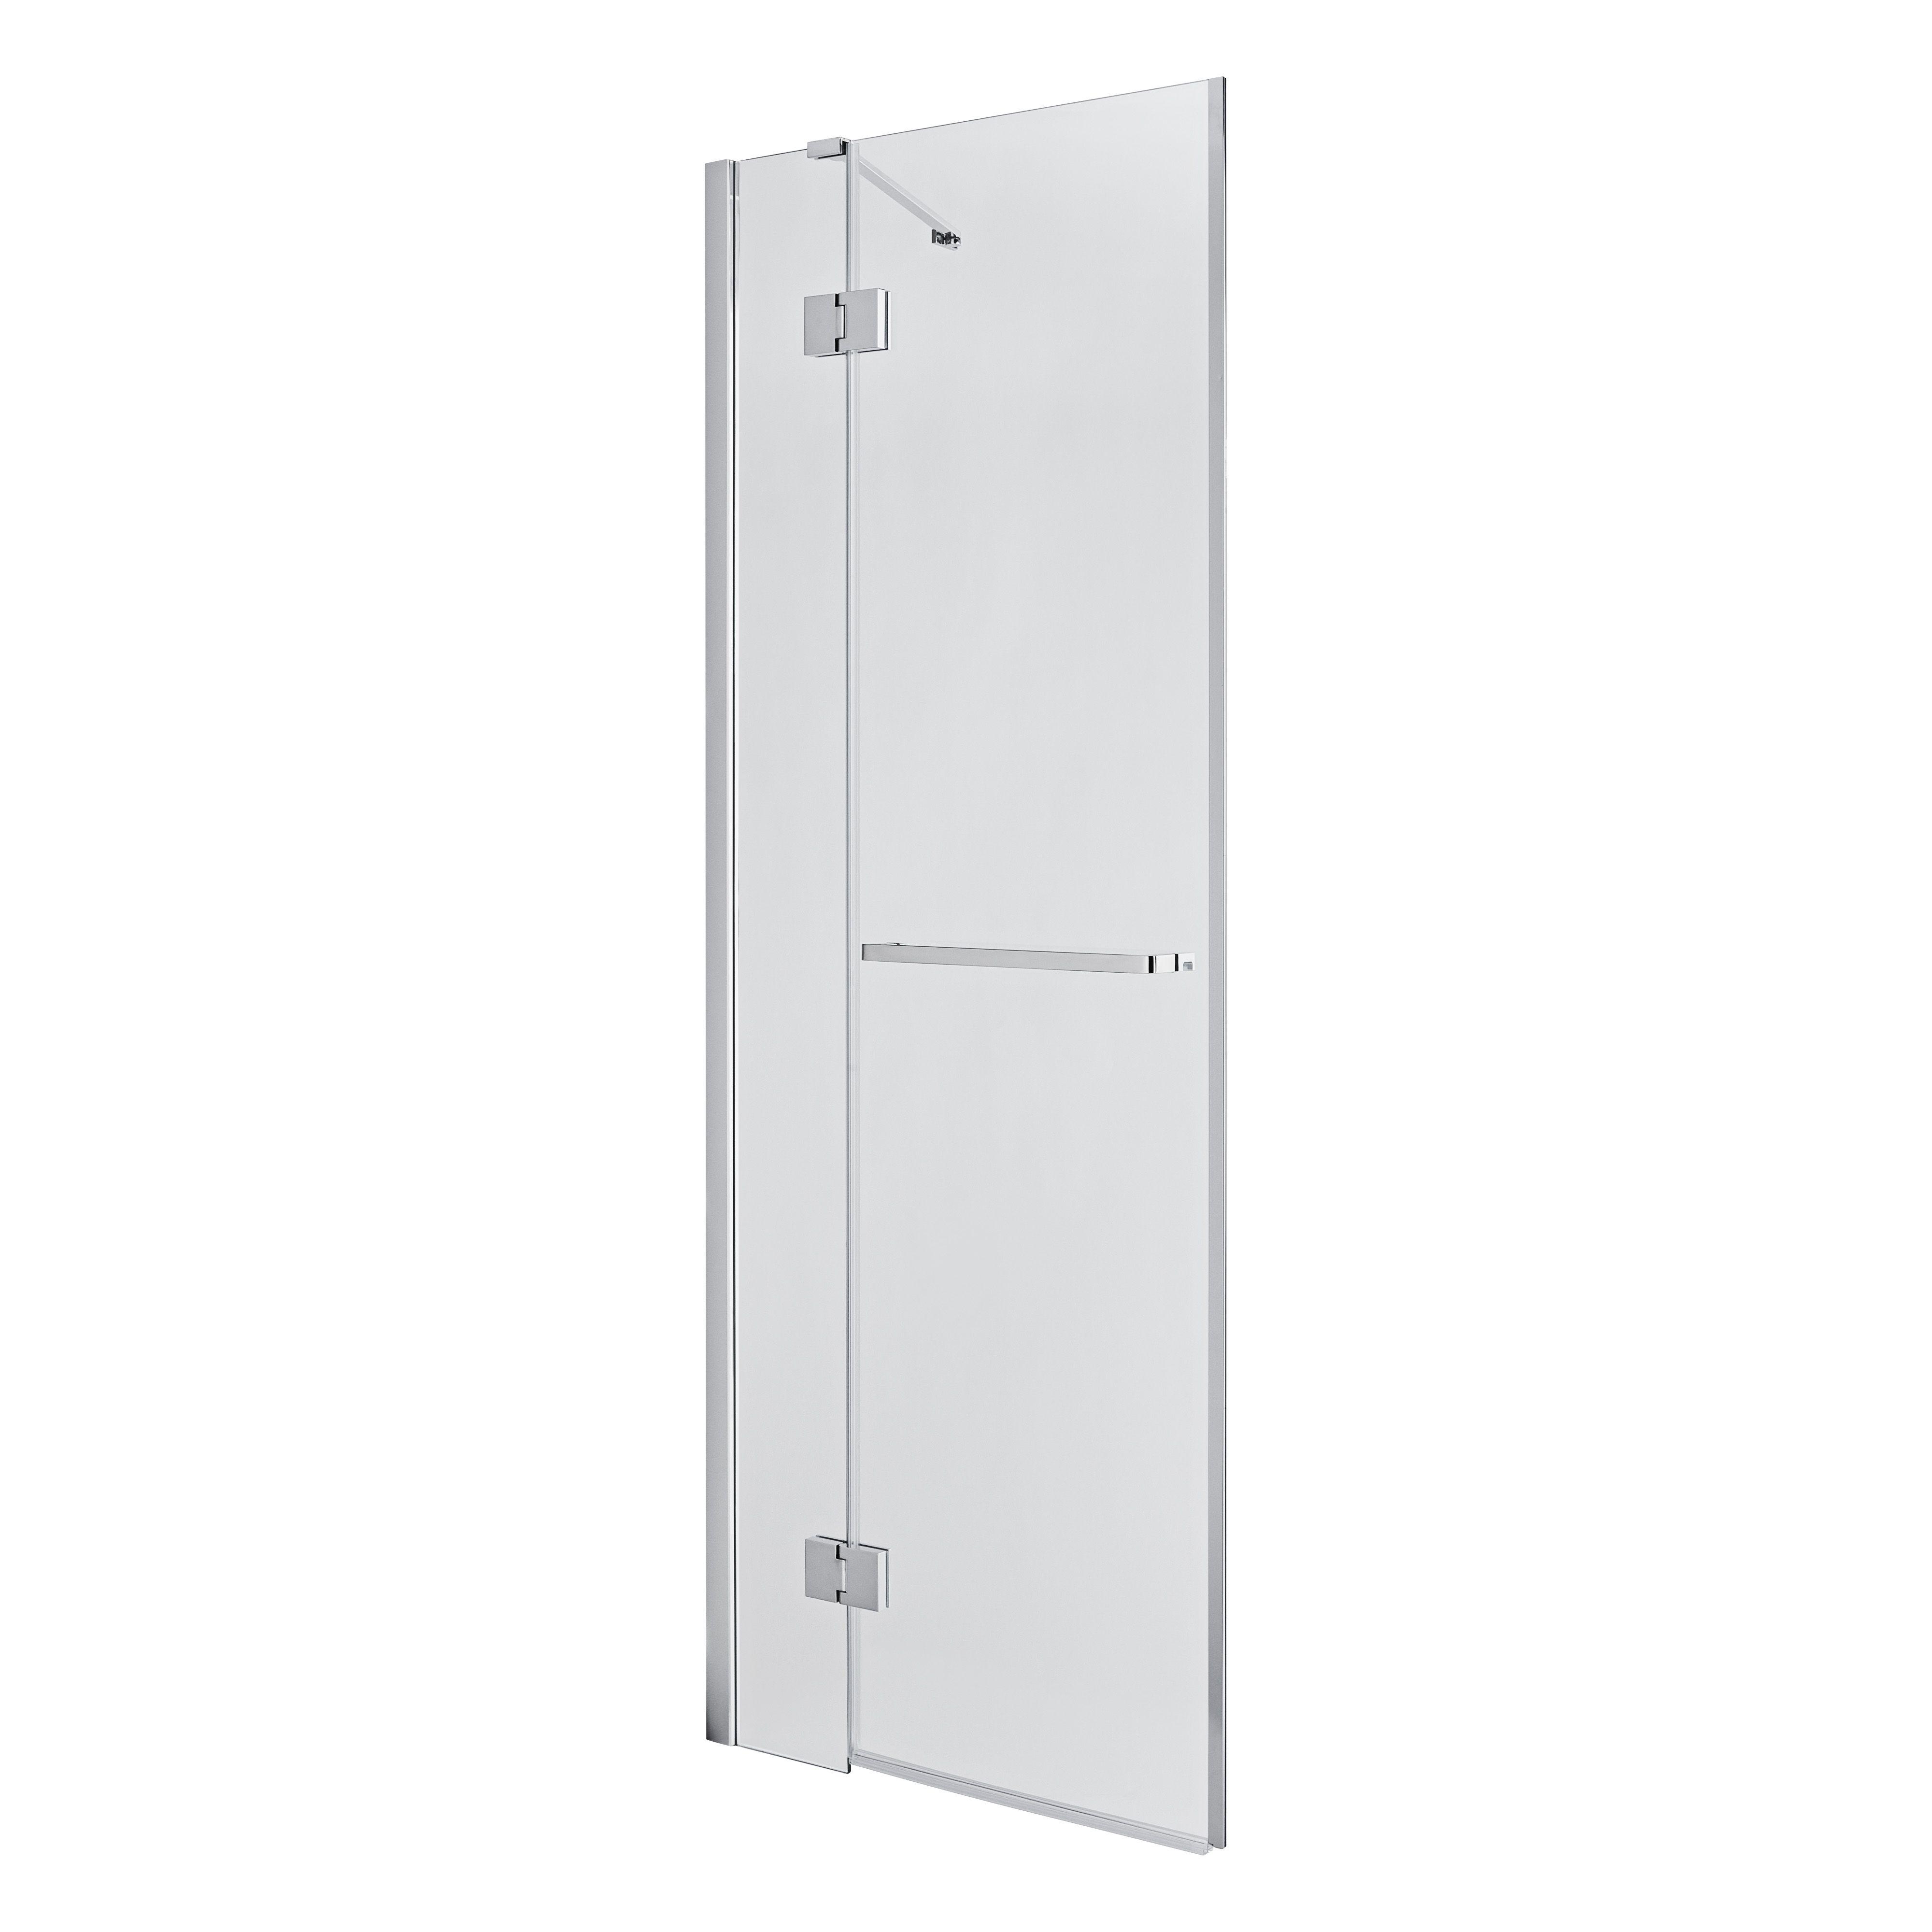 Goodhome Naya Pivot Shower Door W 760mm Departments Diy At B Q